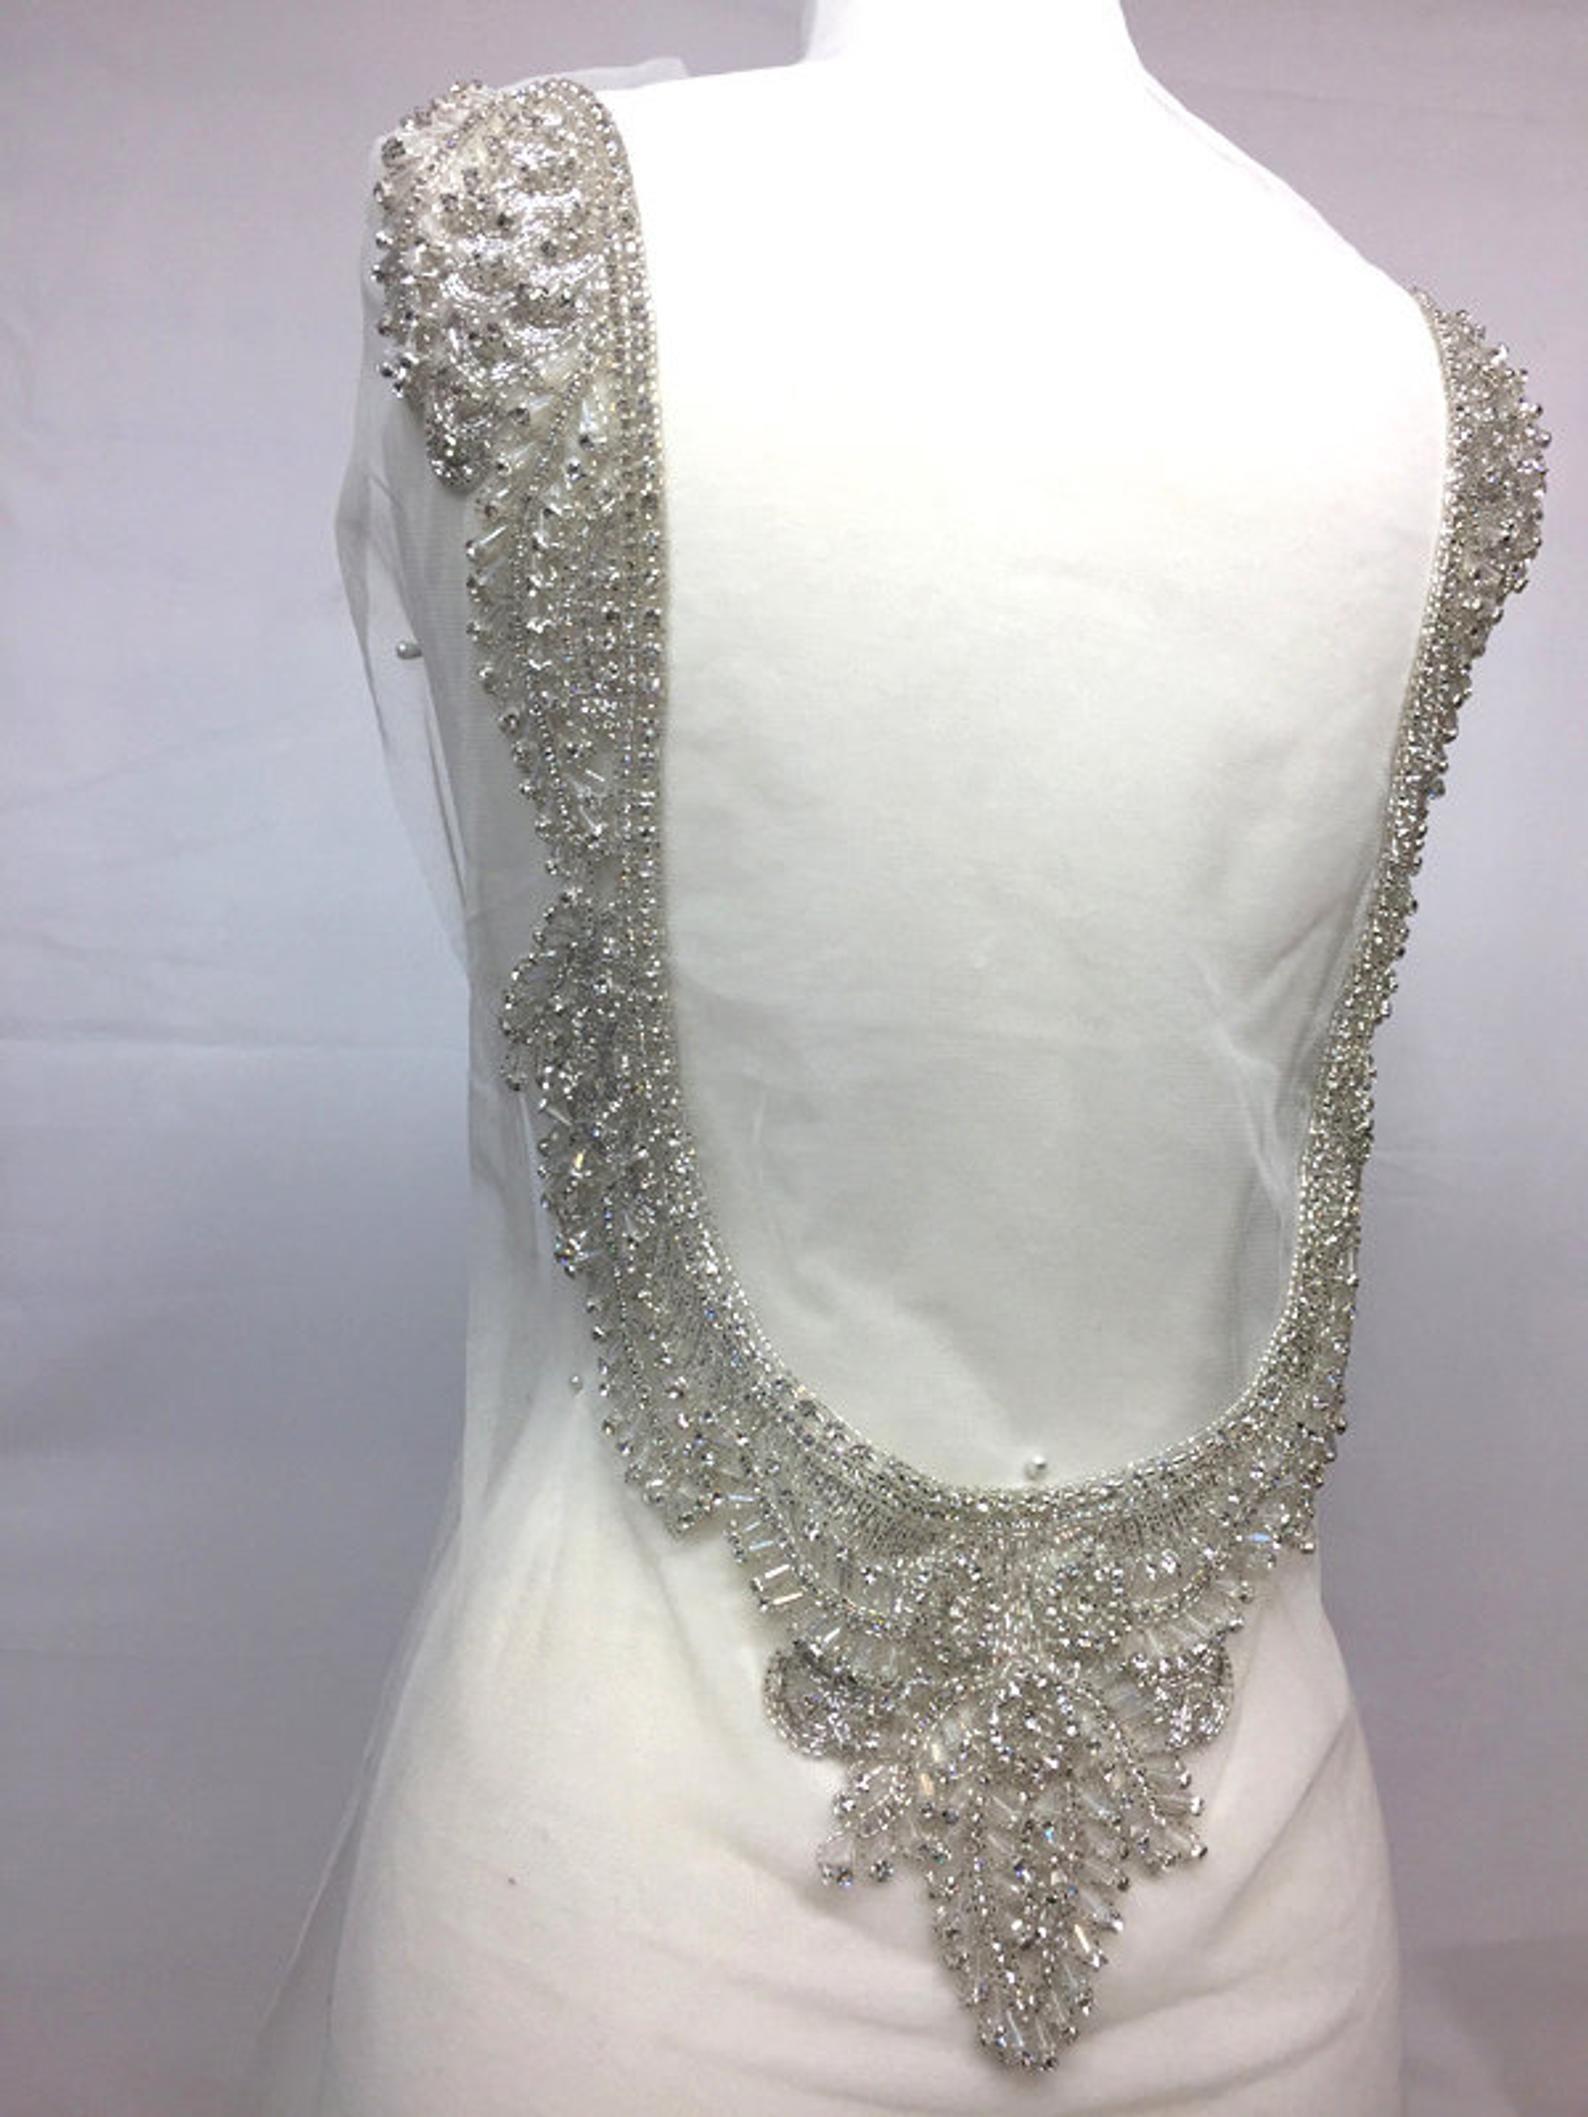 Silver # 82104 Prom,Dress Fabric Fabric,Evening,Wedding Rhinestone Beaded Applique